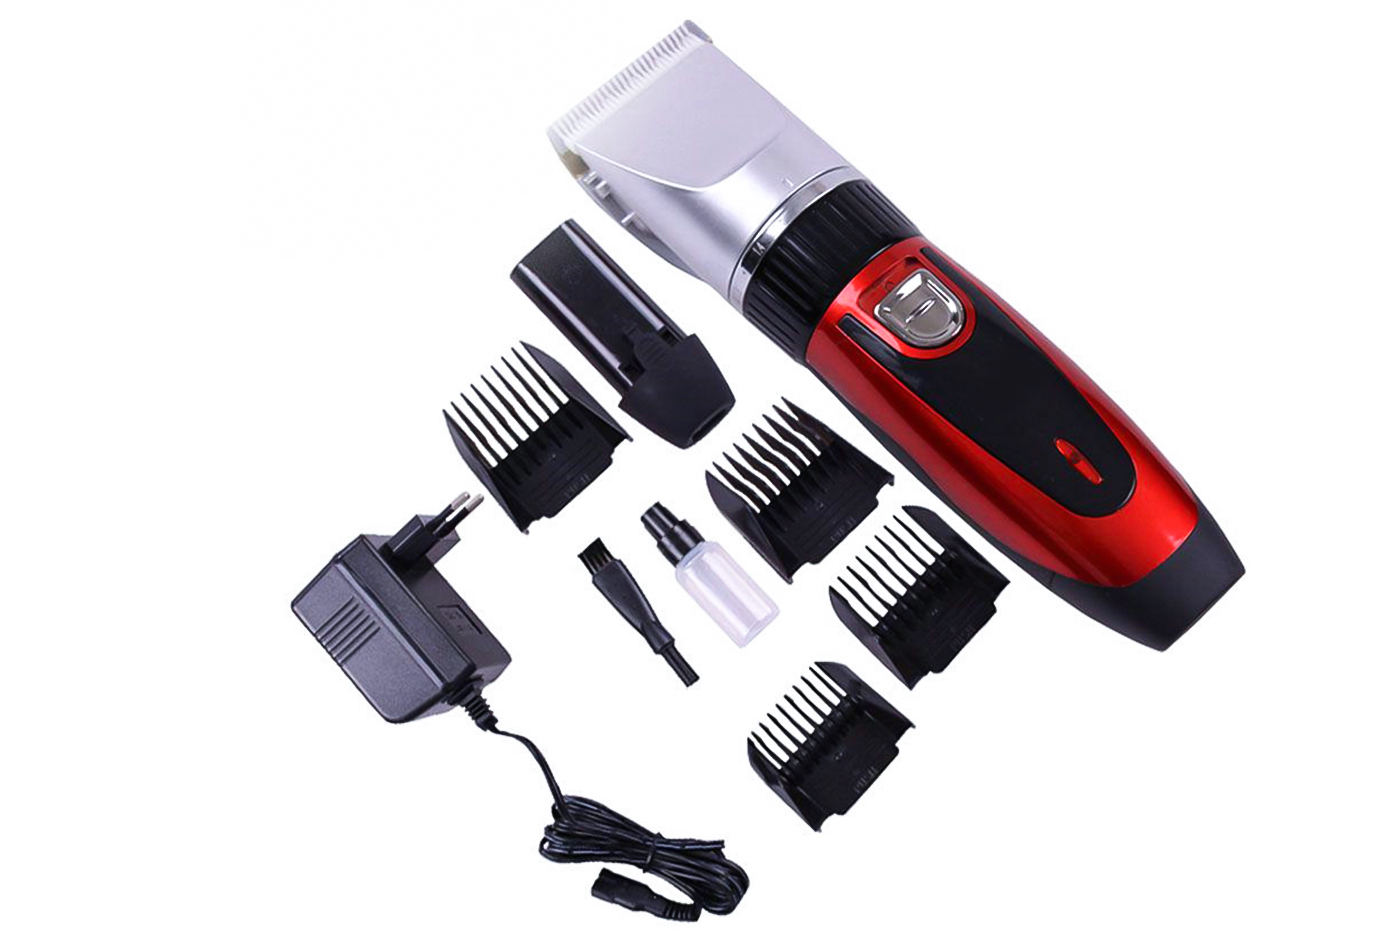 Kit rasoio elettrico taglia capelli 3W regola barba ...